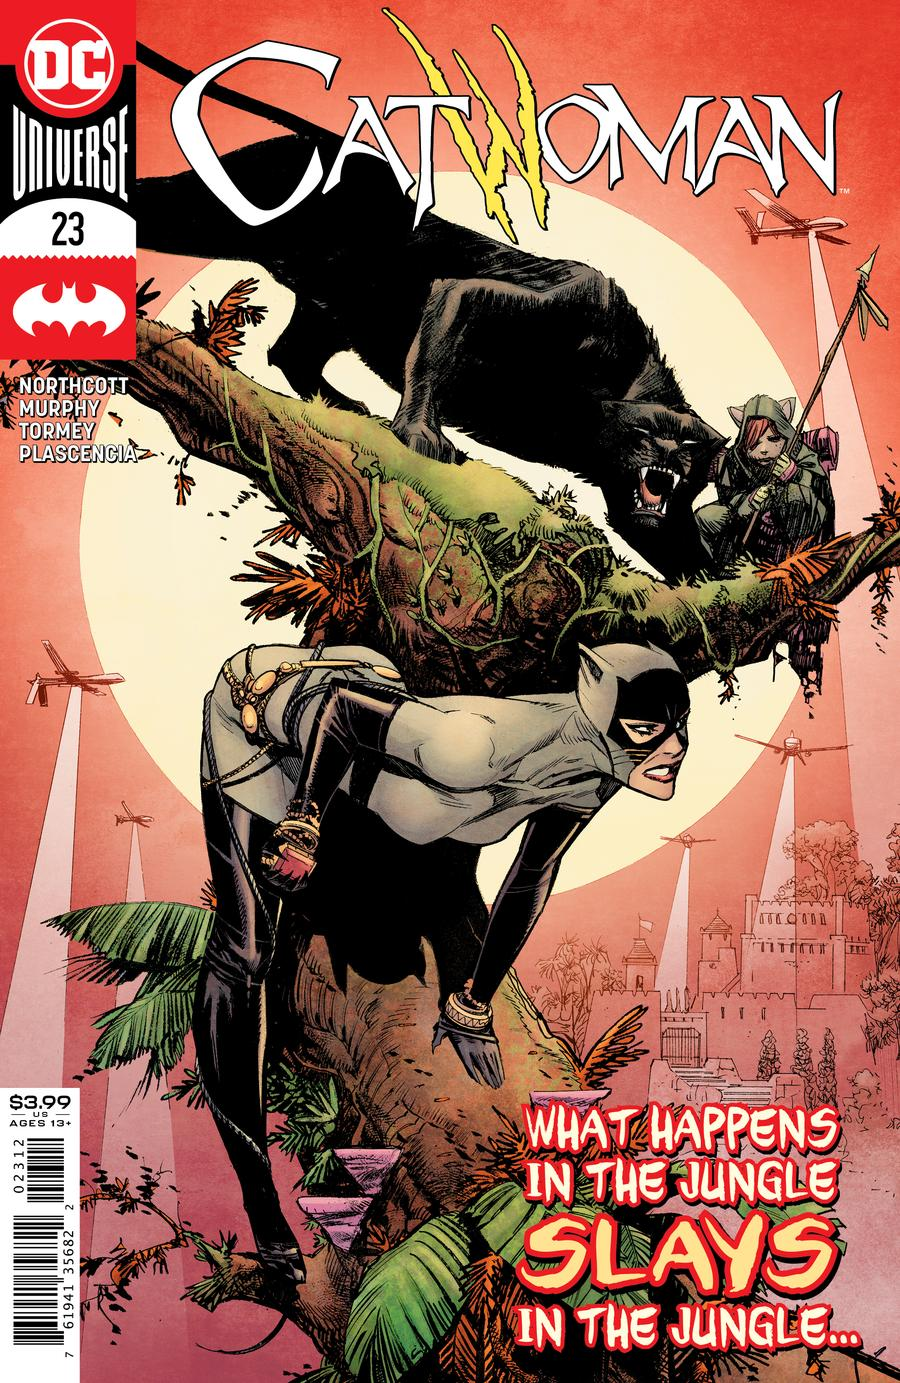 6430_xl ComicList: DC Comics New Releases for 08/19/2020